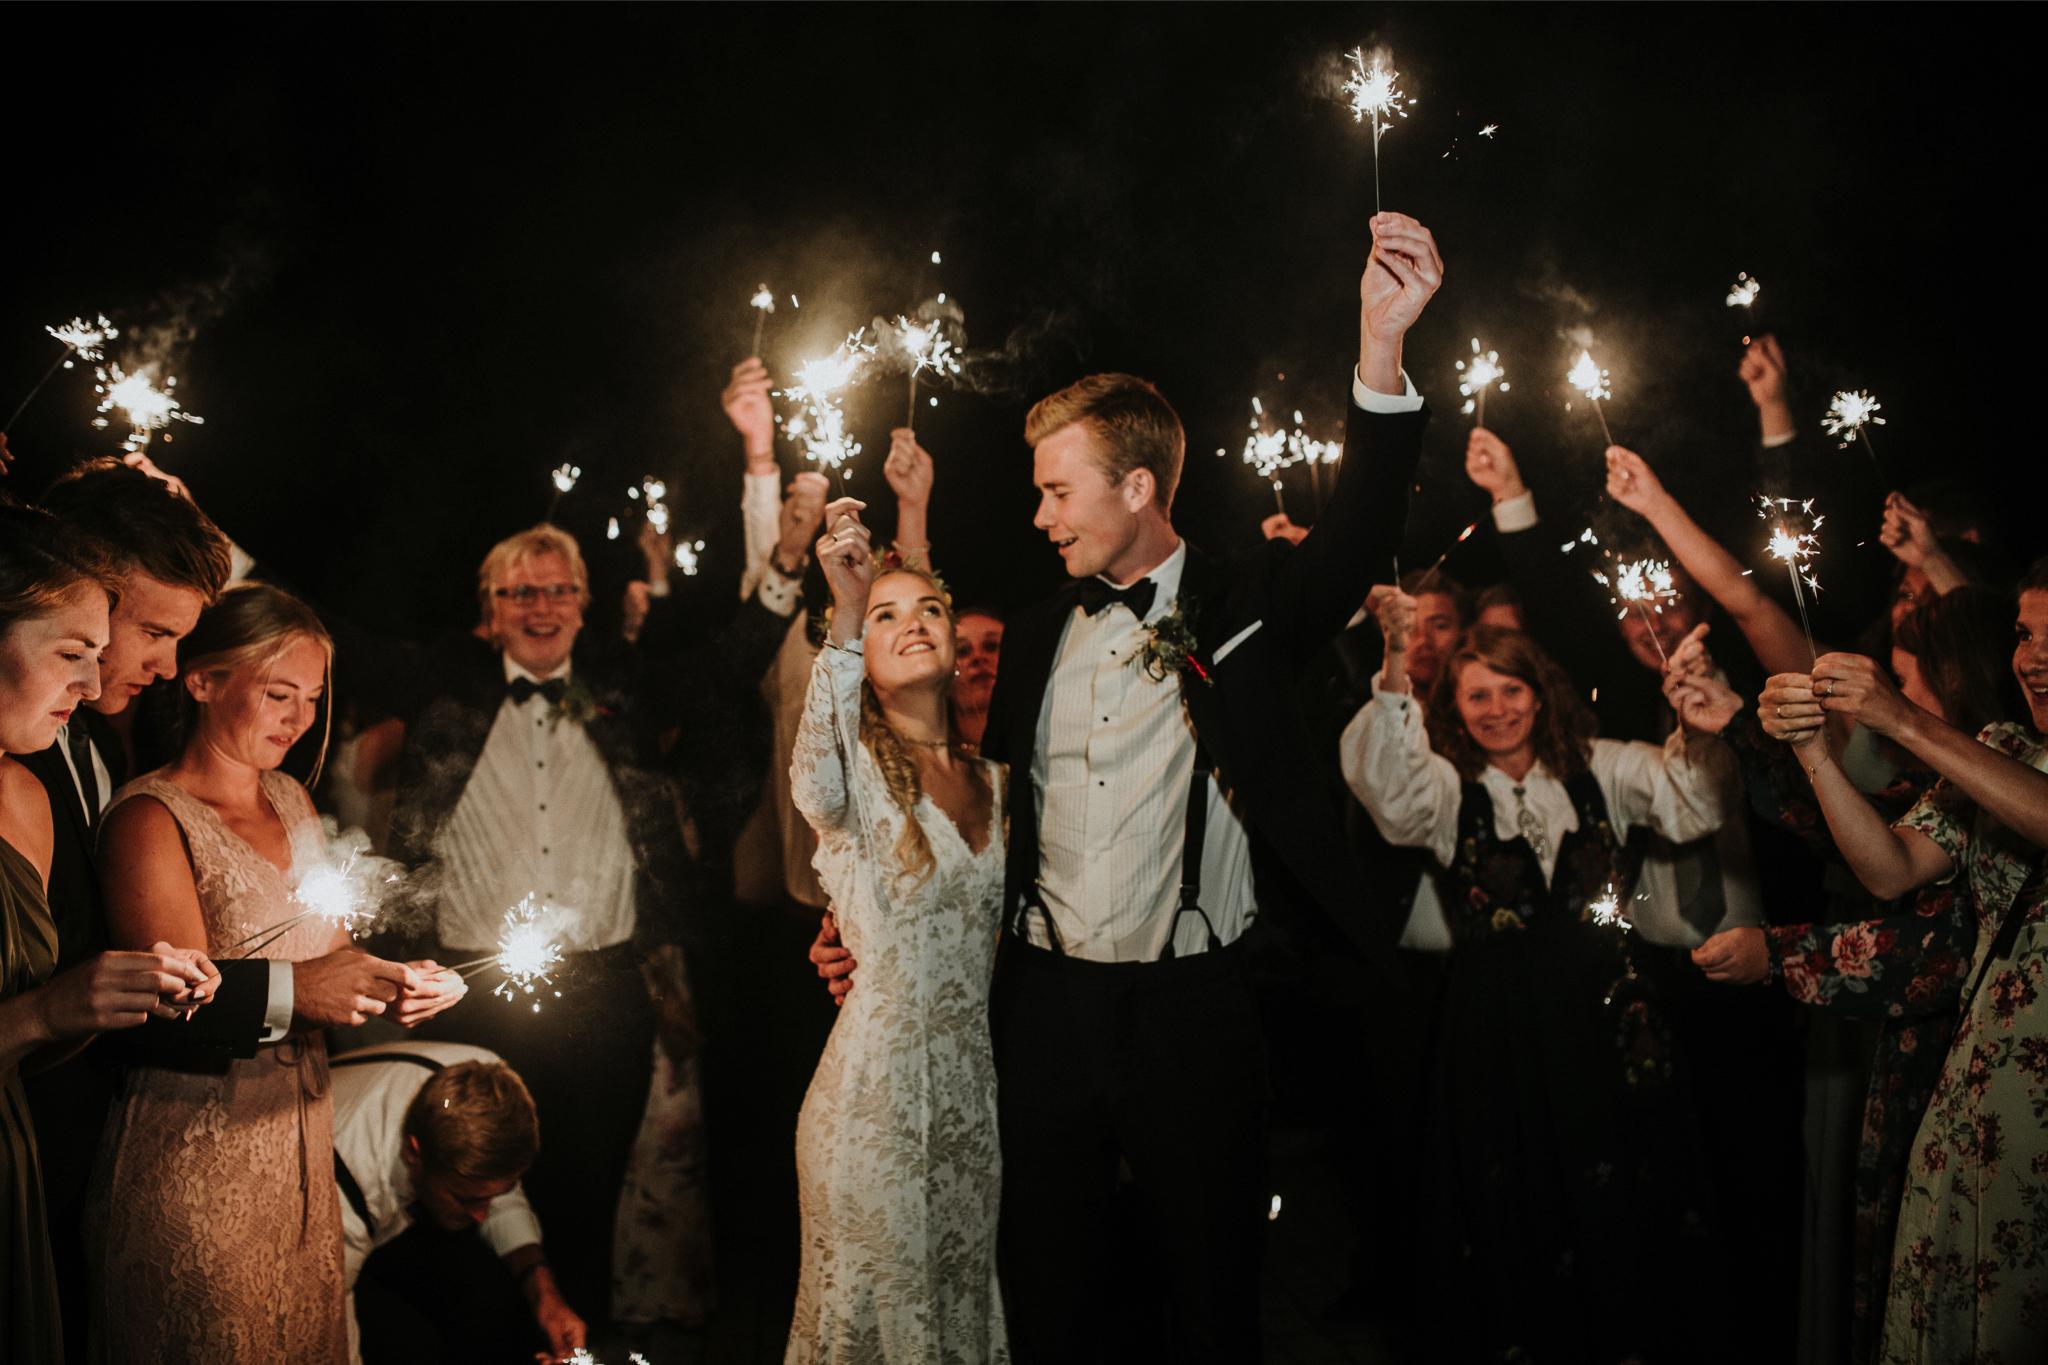 Norway-wedding-photographer-adventure-session_5.jpg